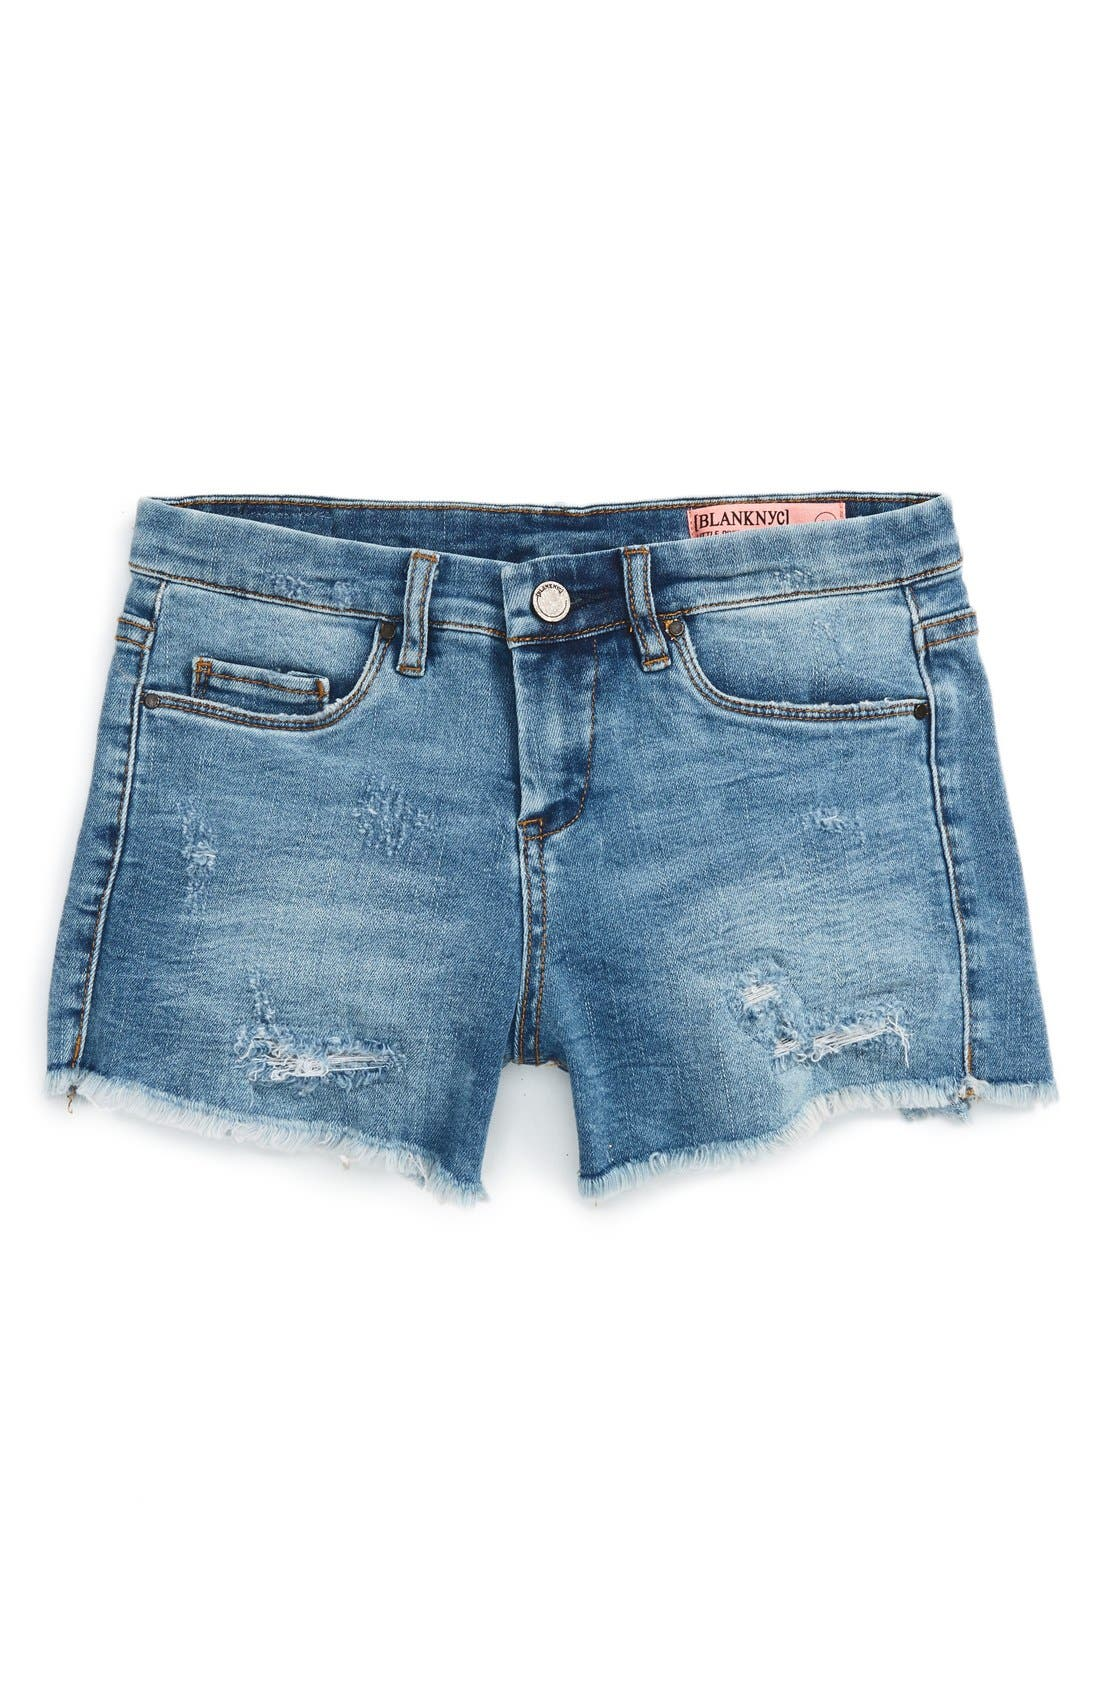 Alternate Image 1 Selected - BLANKNYC Cutoff Denim Shorts (Big Girls)